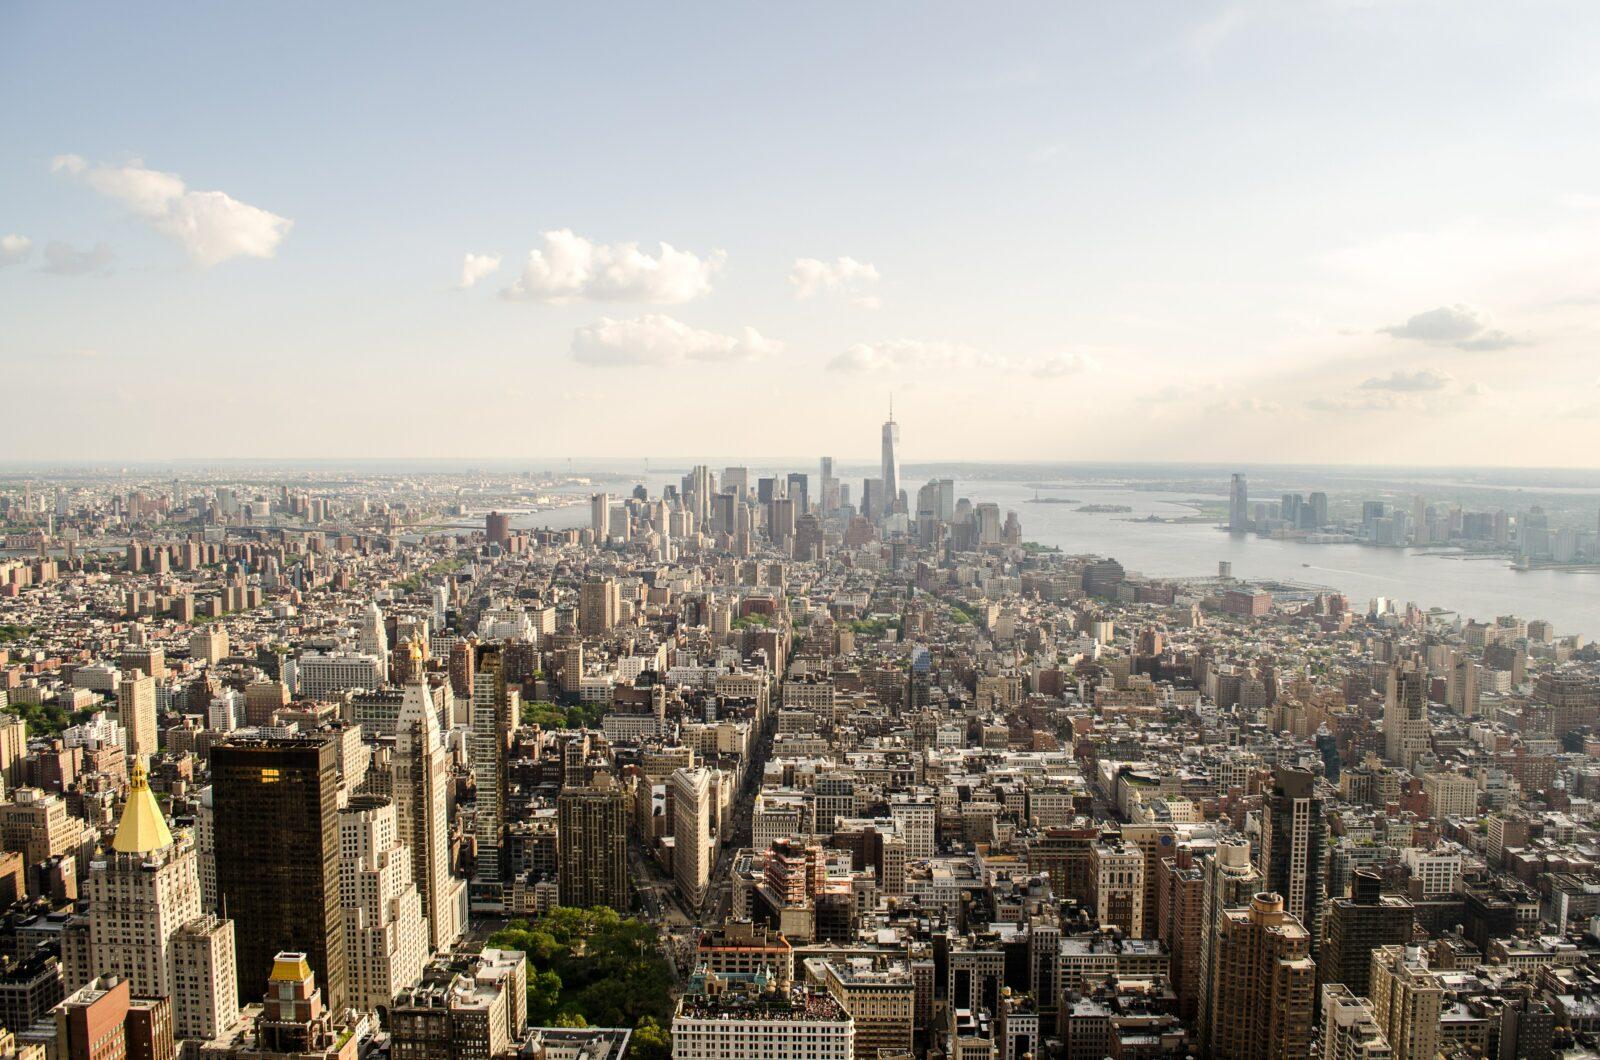 manhattan new york city skyline from above